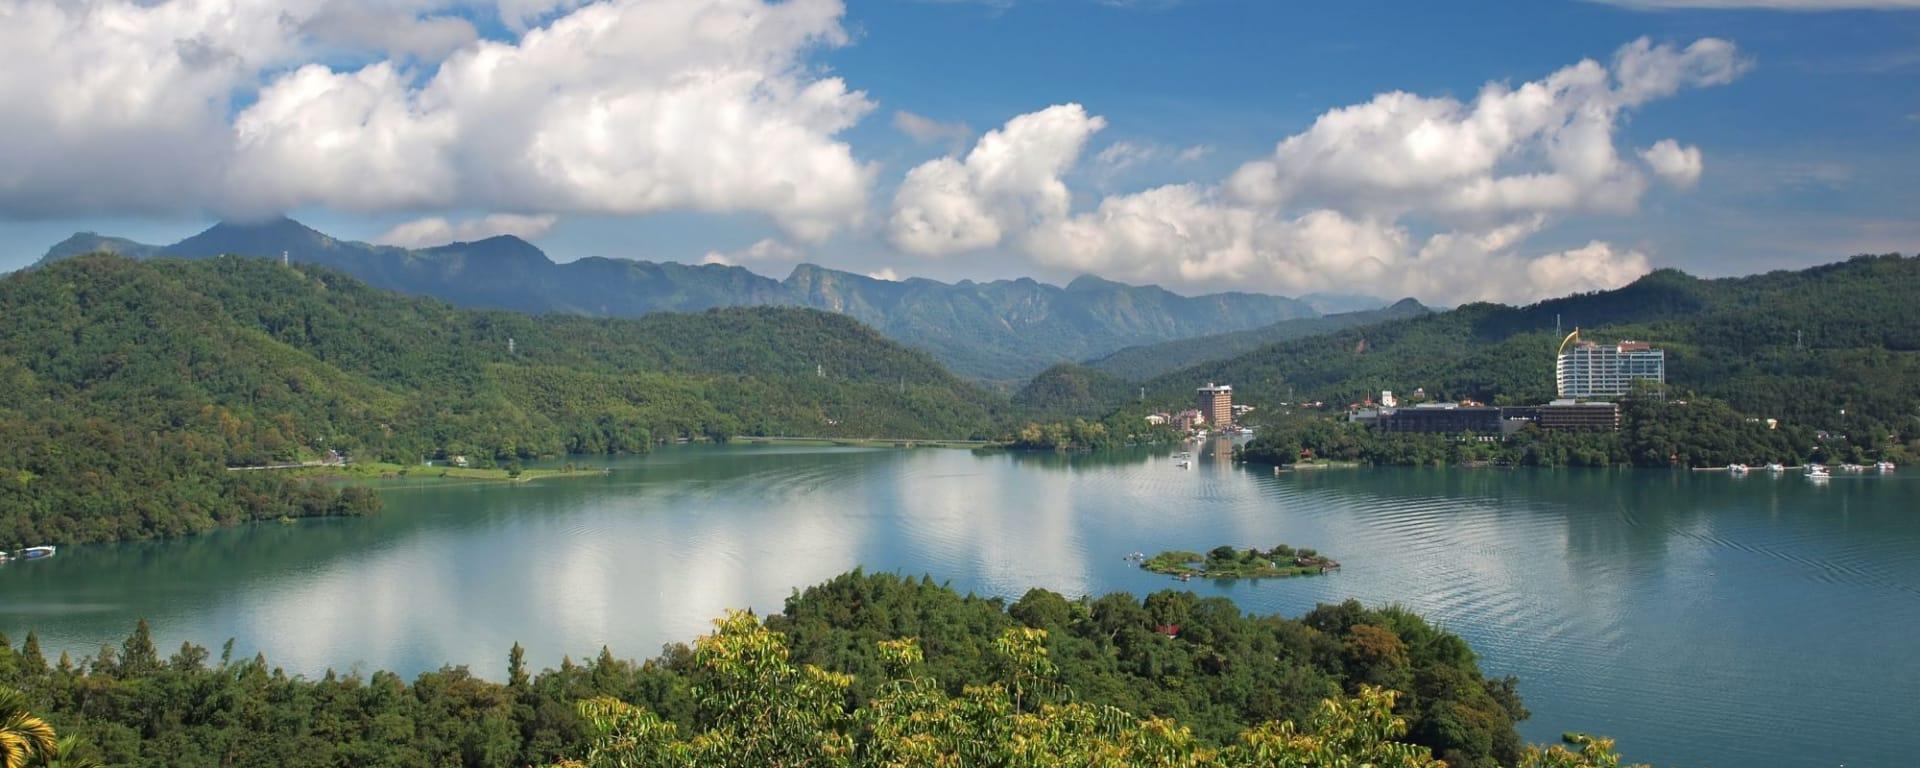 Le meilleur de Taïwan de Taipei: Sun Moon Lake Taiwan